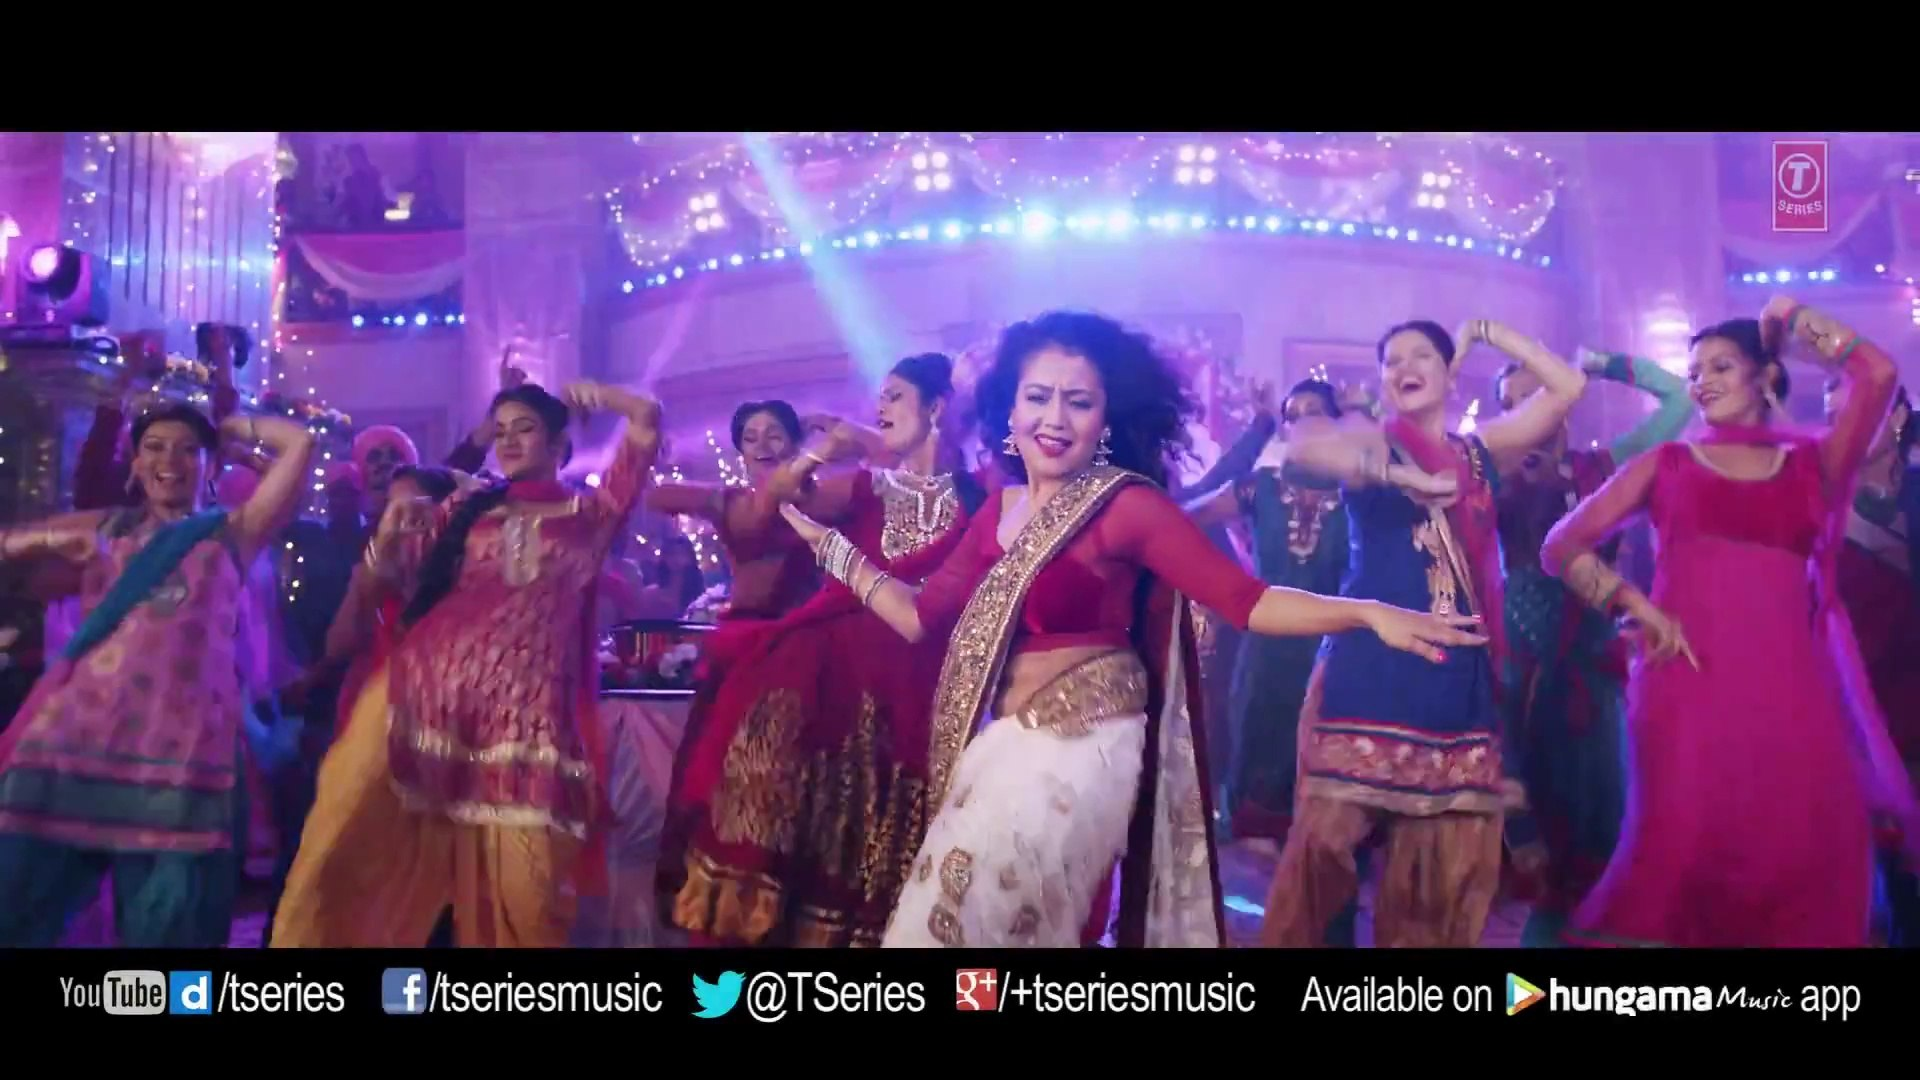 Shilpa Shetty Wedding Da Season Song 2015 Hd 1080p Feat Neha Kakkar Fresh Songs Hd Video Dailymotion